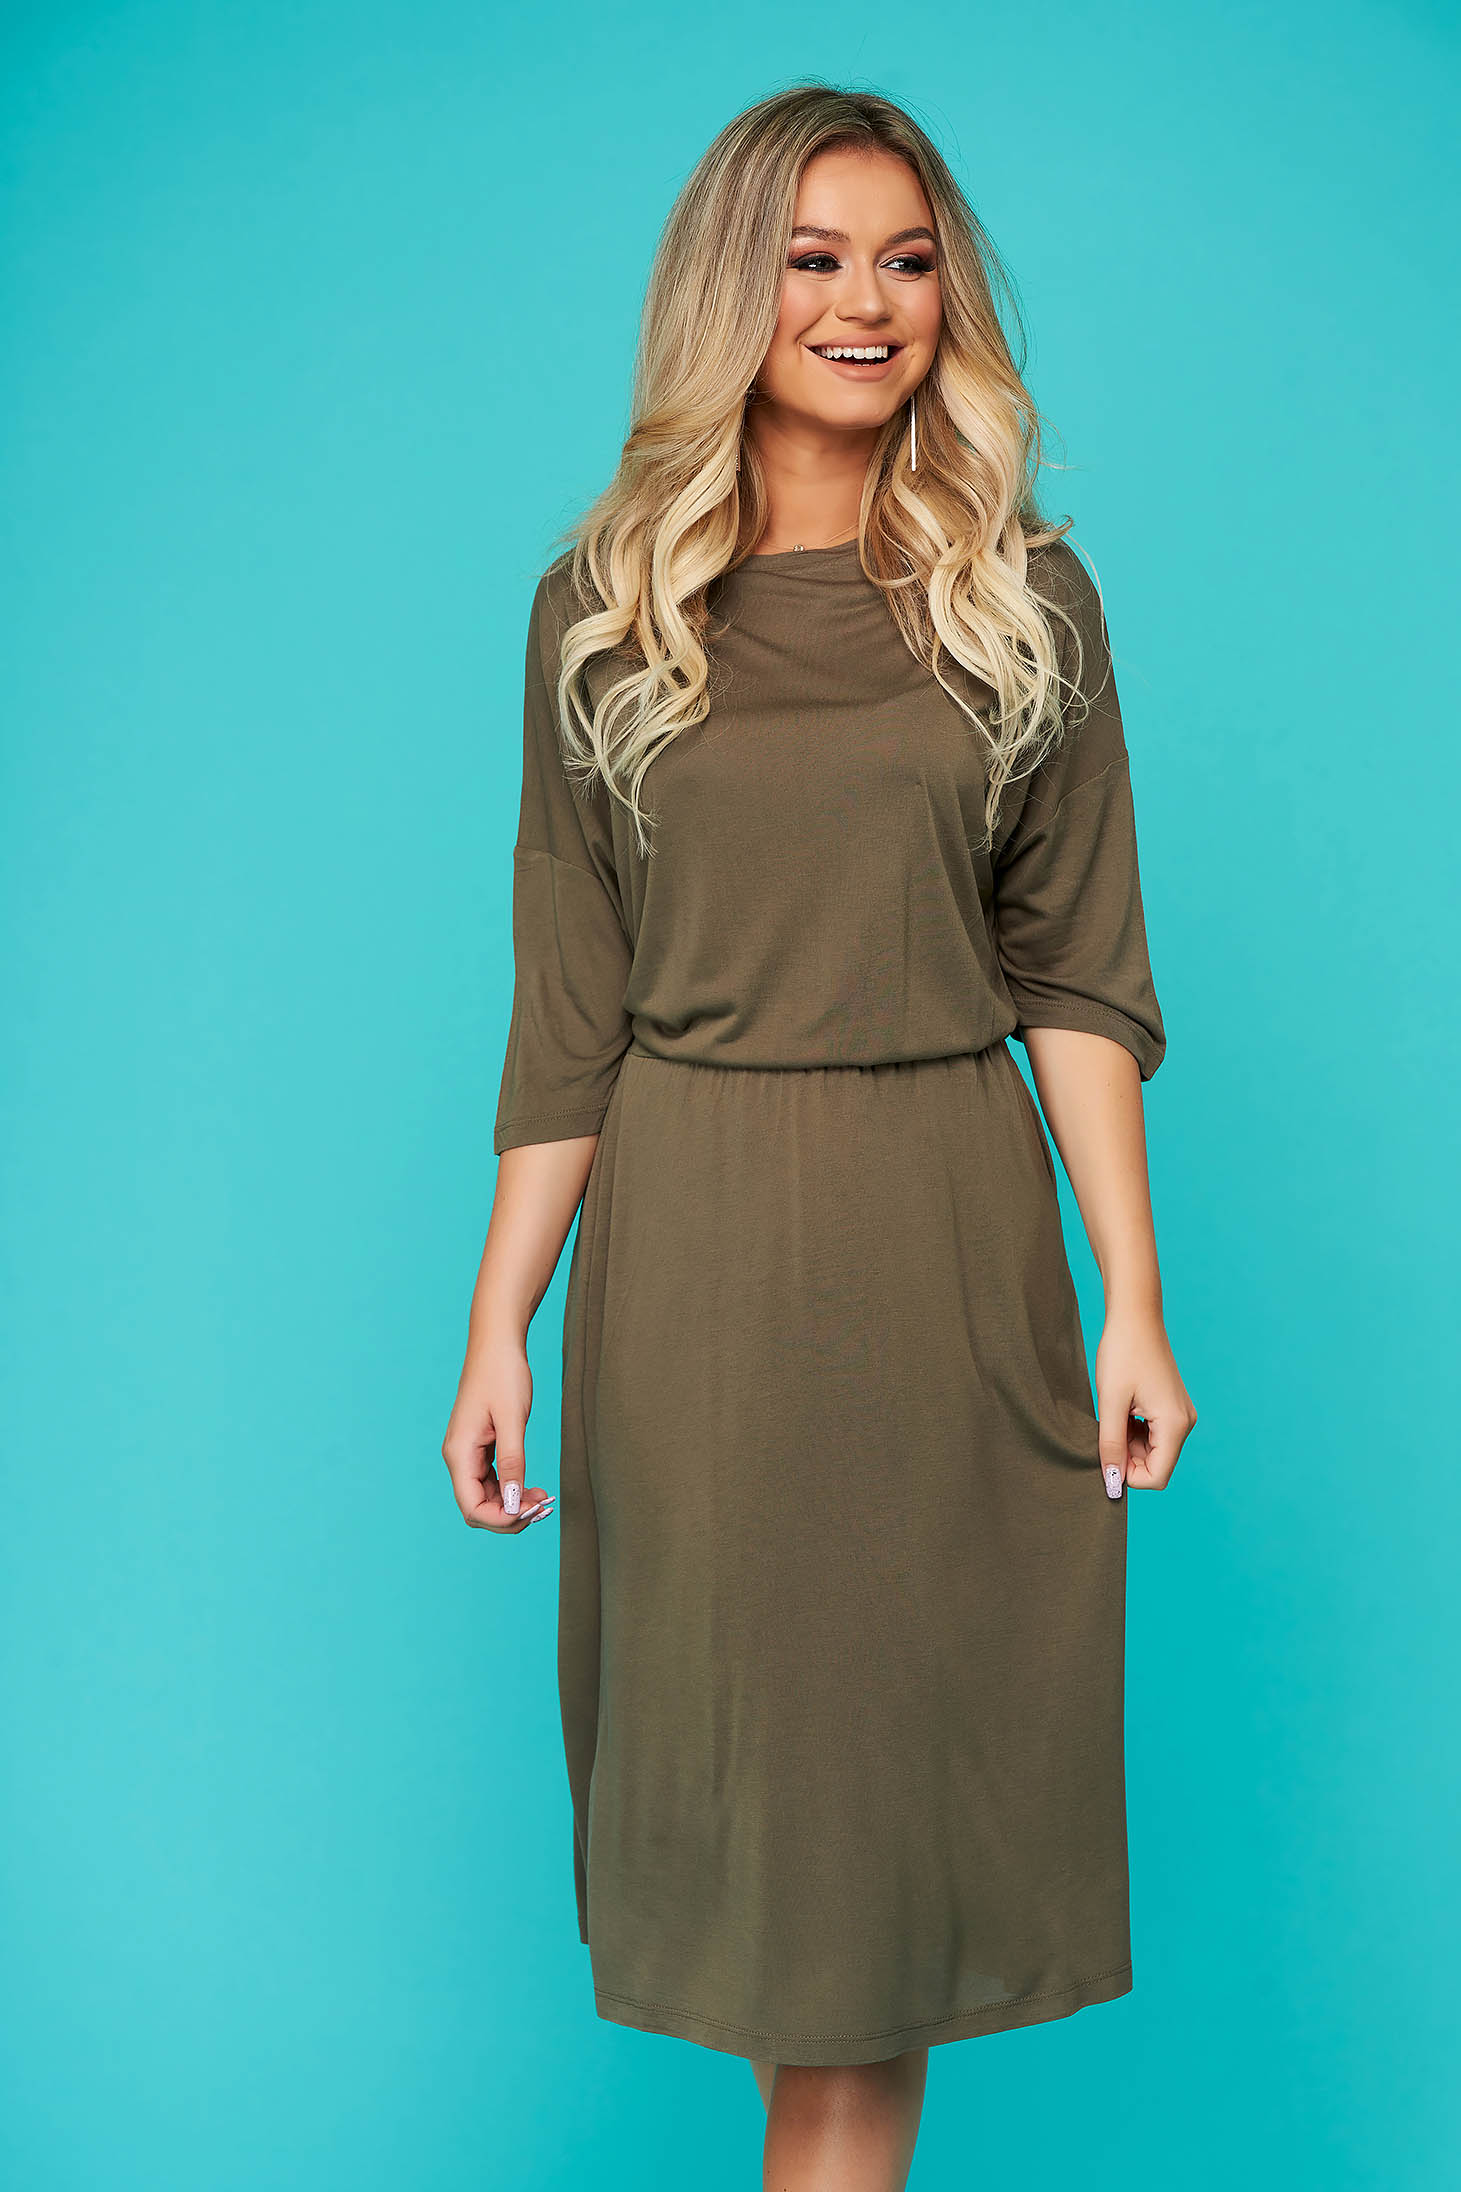 Green dress daily cloche midi long sleeved